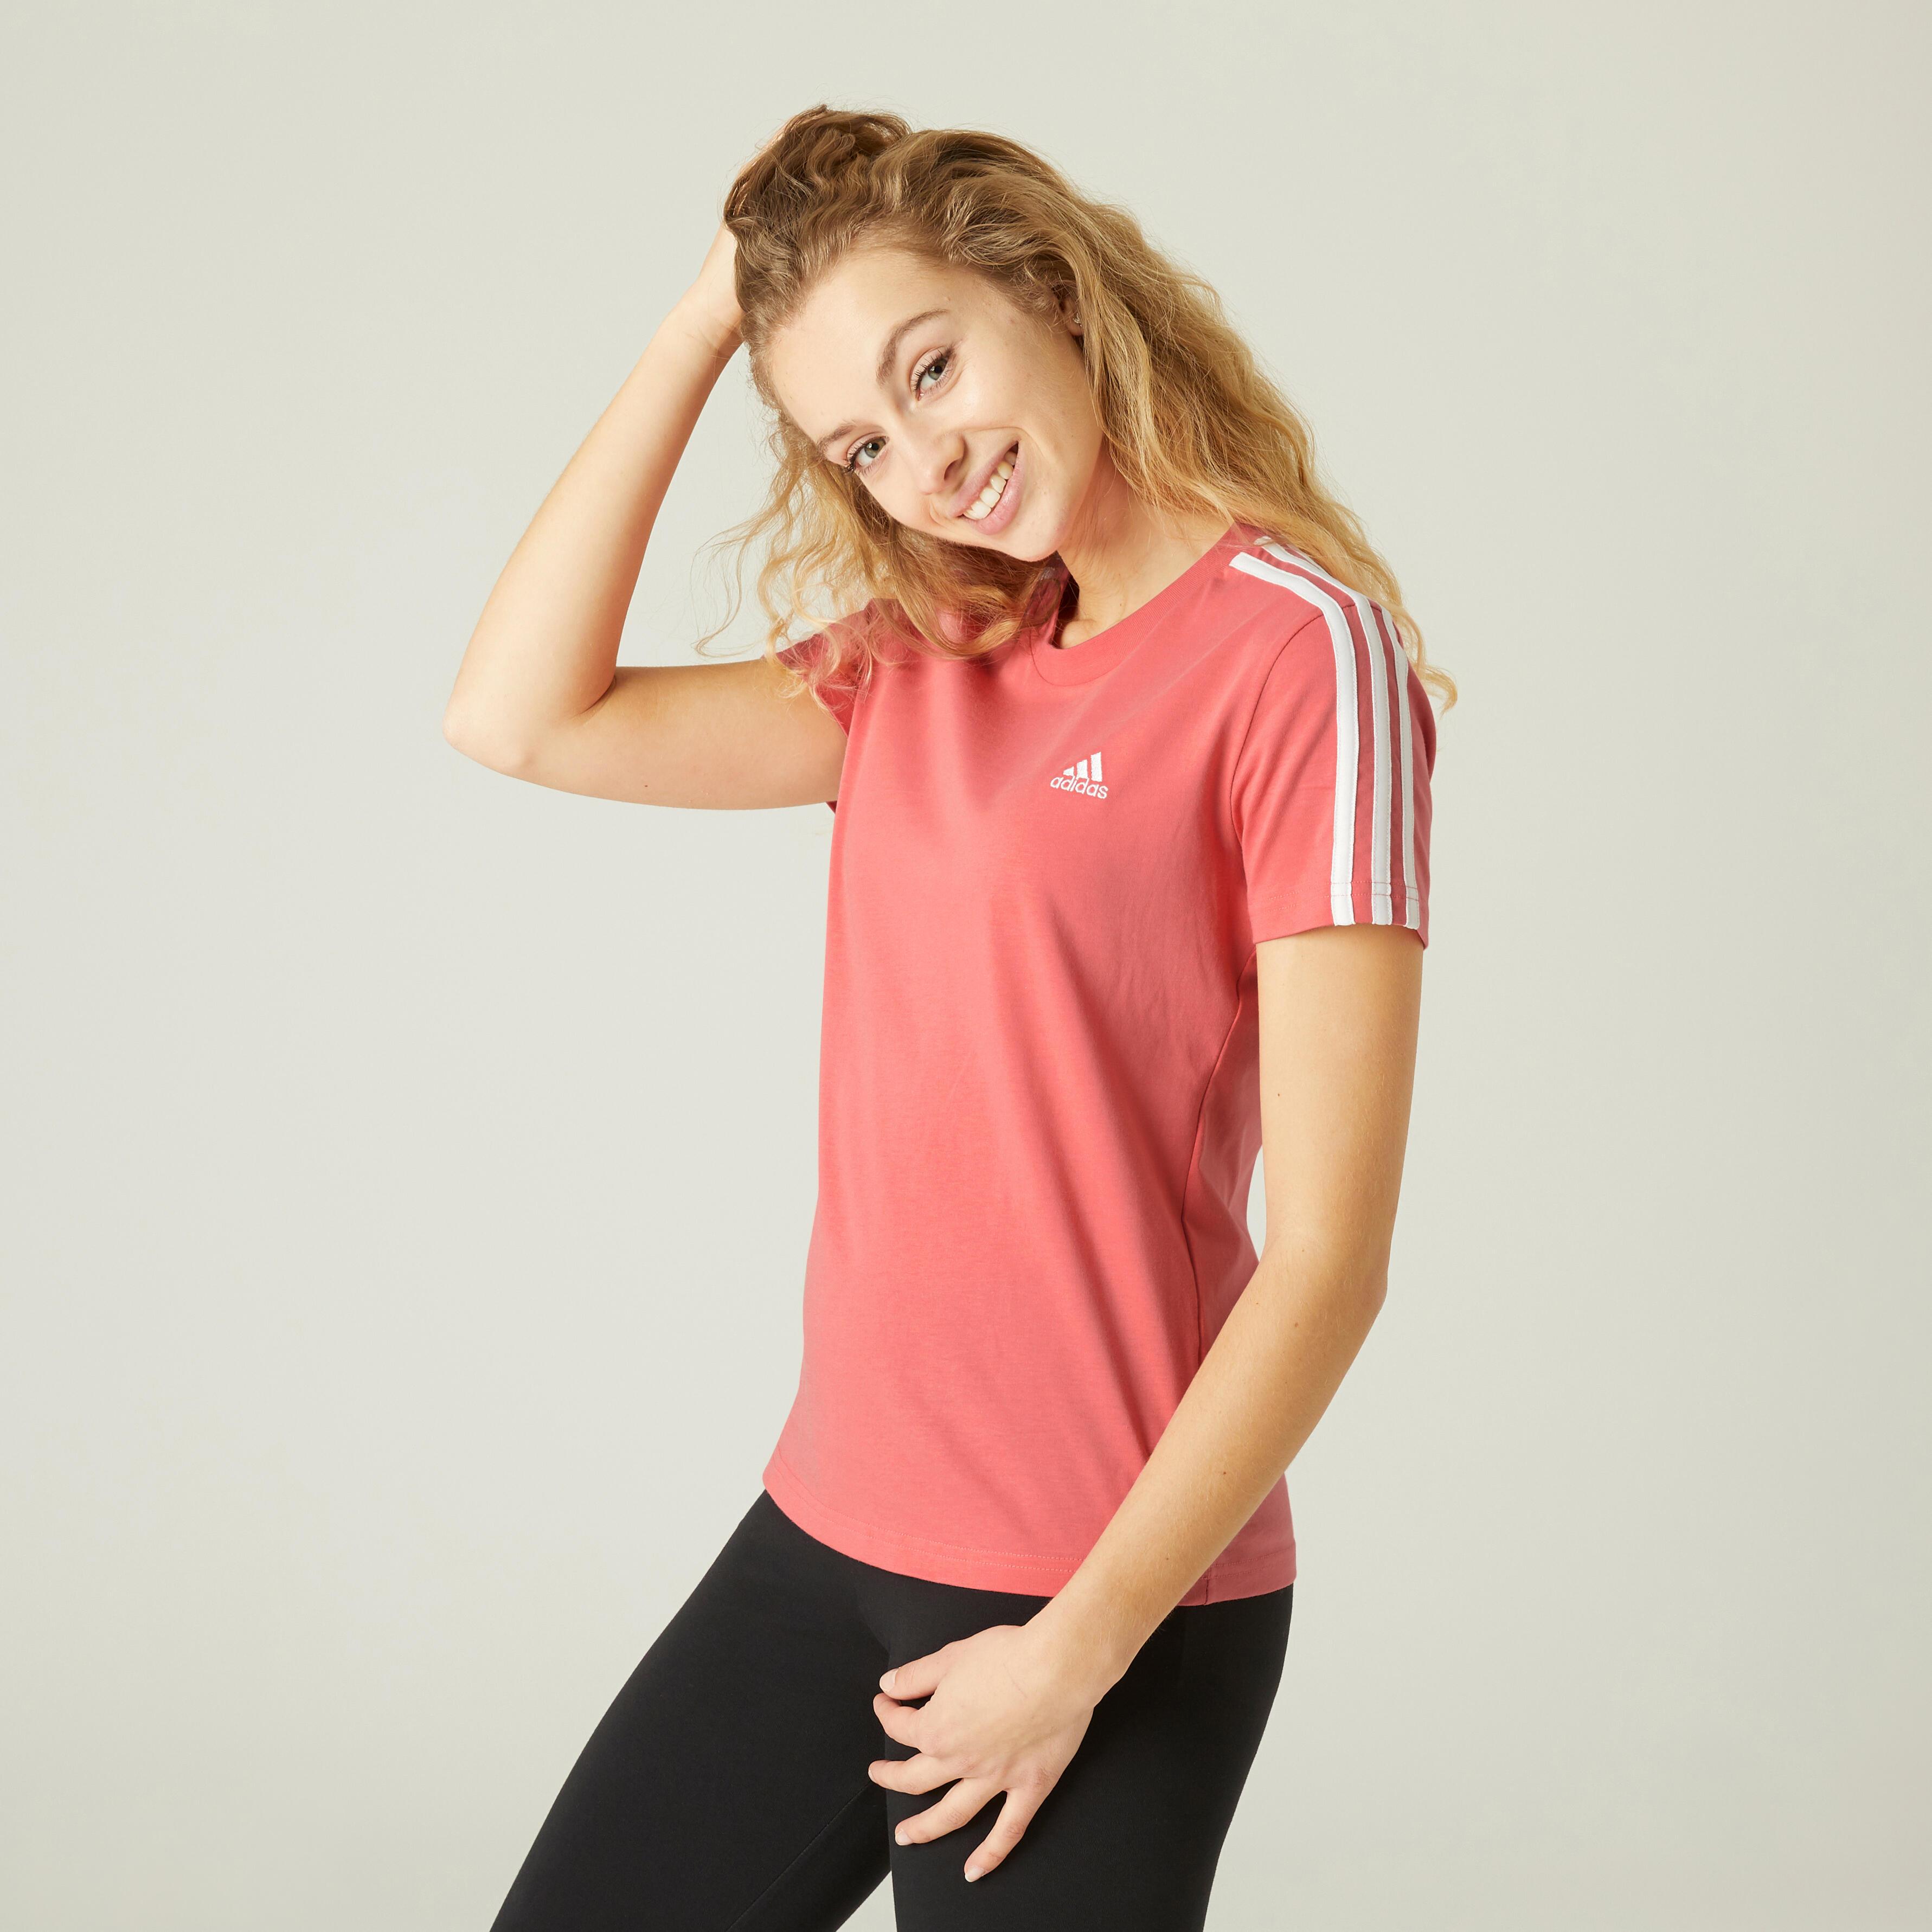 Tricou Adidas Fitness Damă imagine